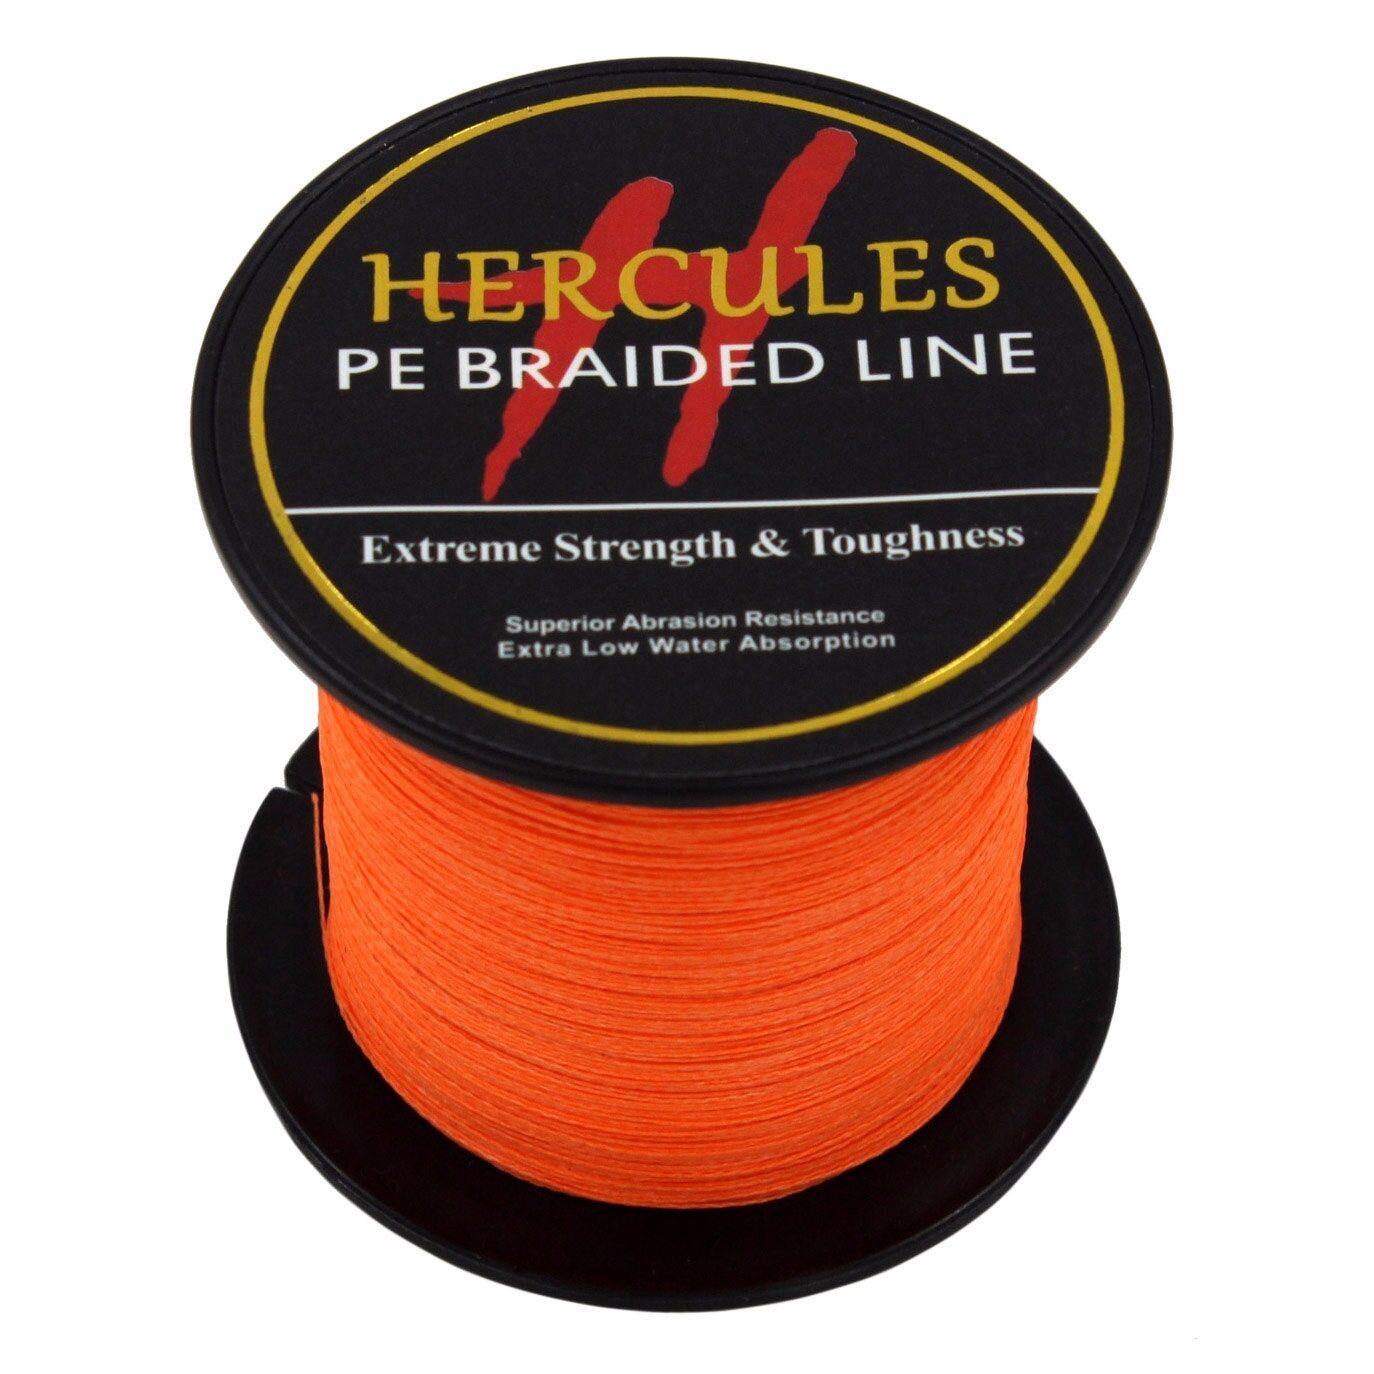 Hercules 6lb-300lb 100M Power Super PE Strong 109Yds Braid Fishing Line Extreme